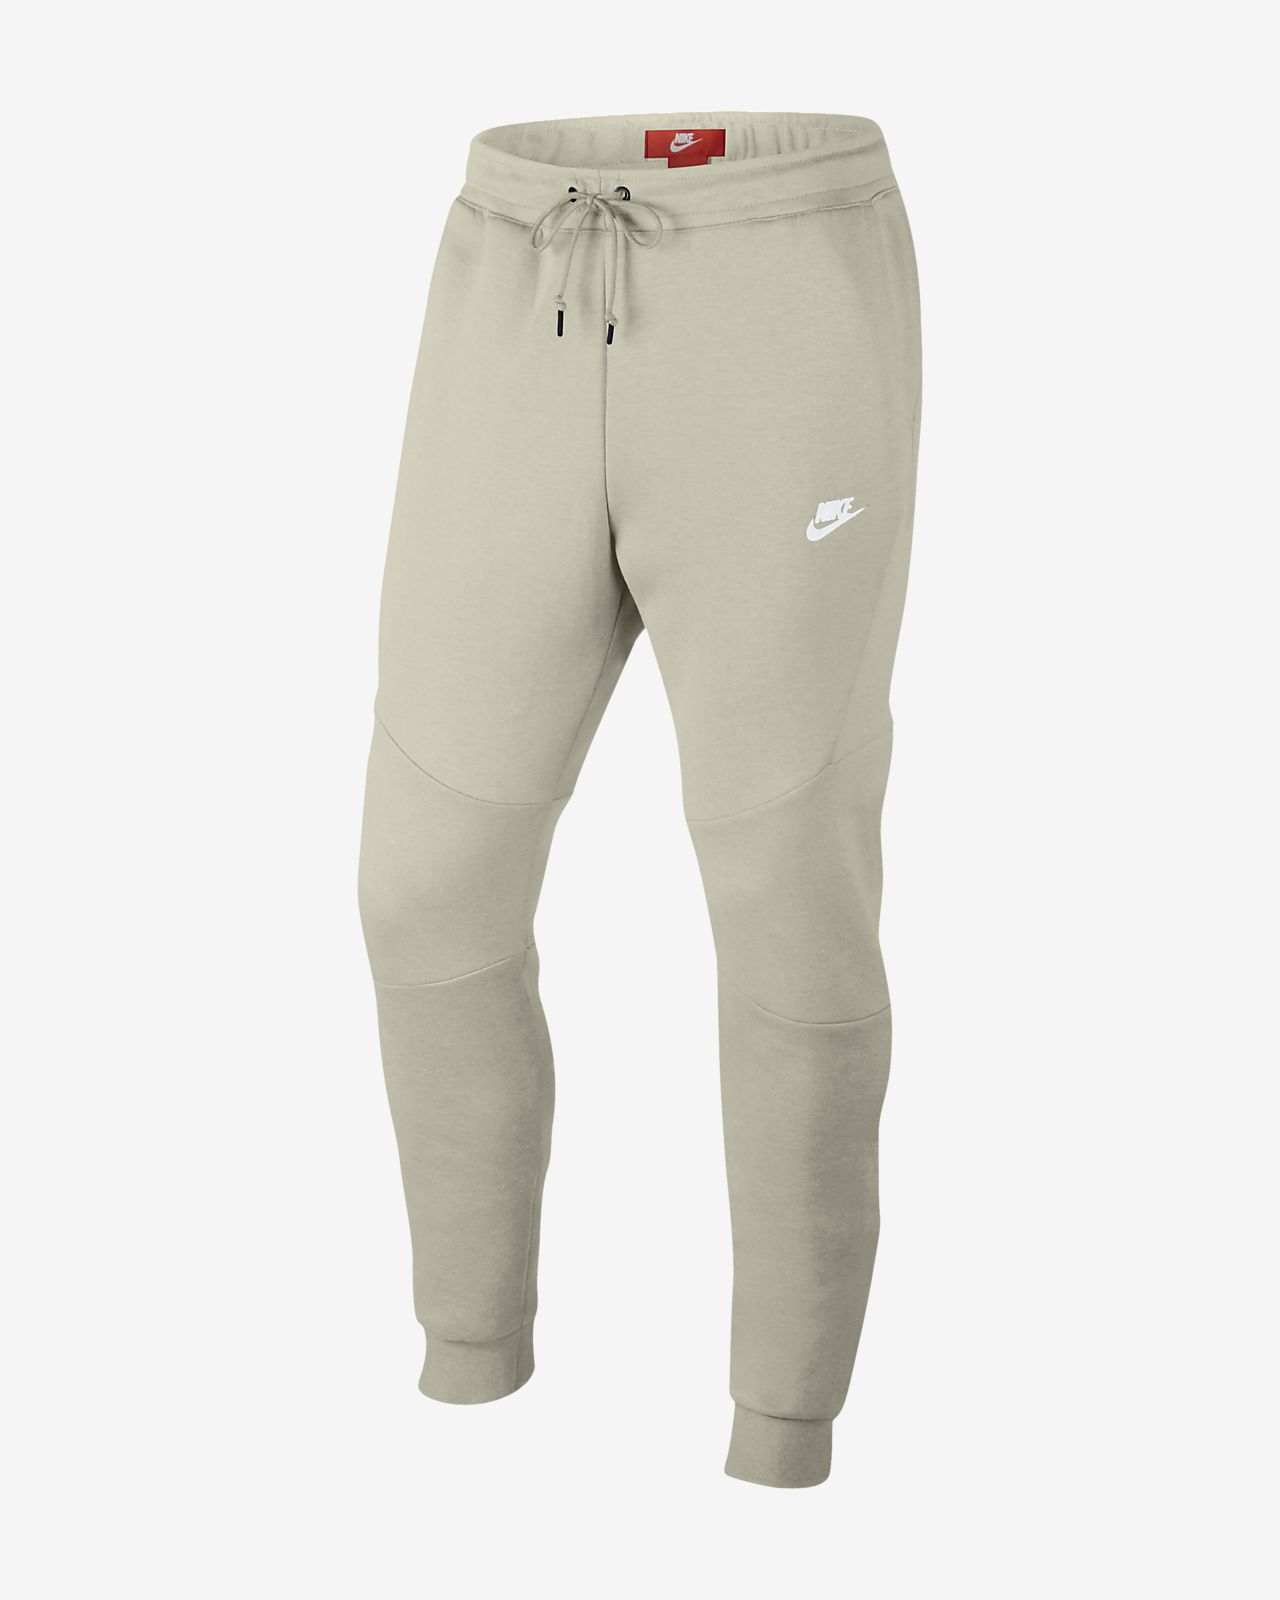 a8aed2662639ff Nike Sportswear Tech Fleece Herren-Jogger. Nike.com LU